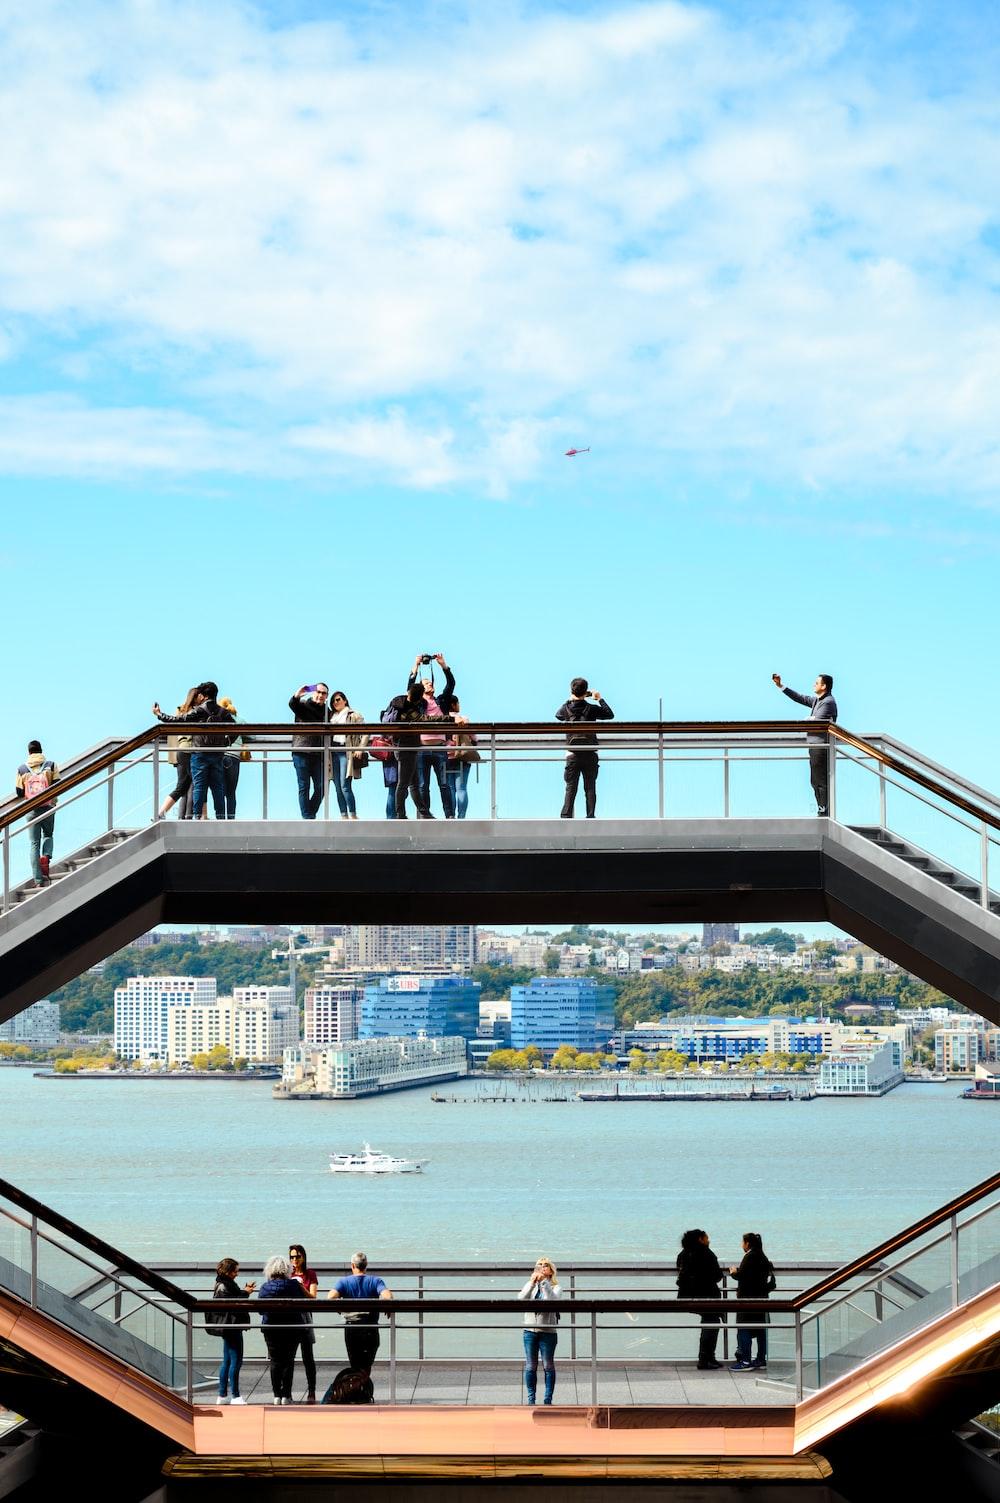 people standing on concrete bridge during daytime